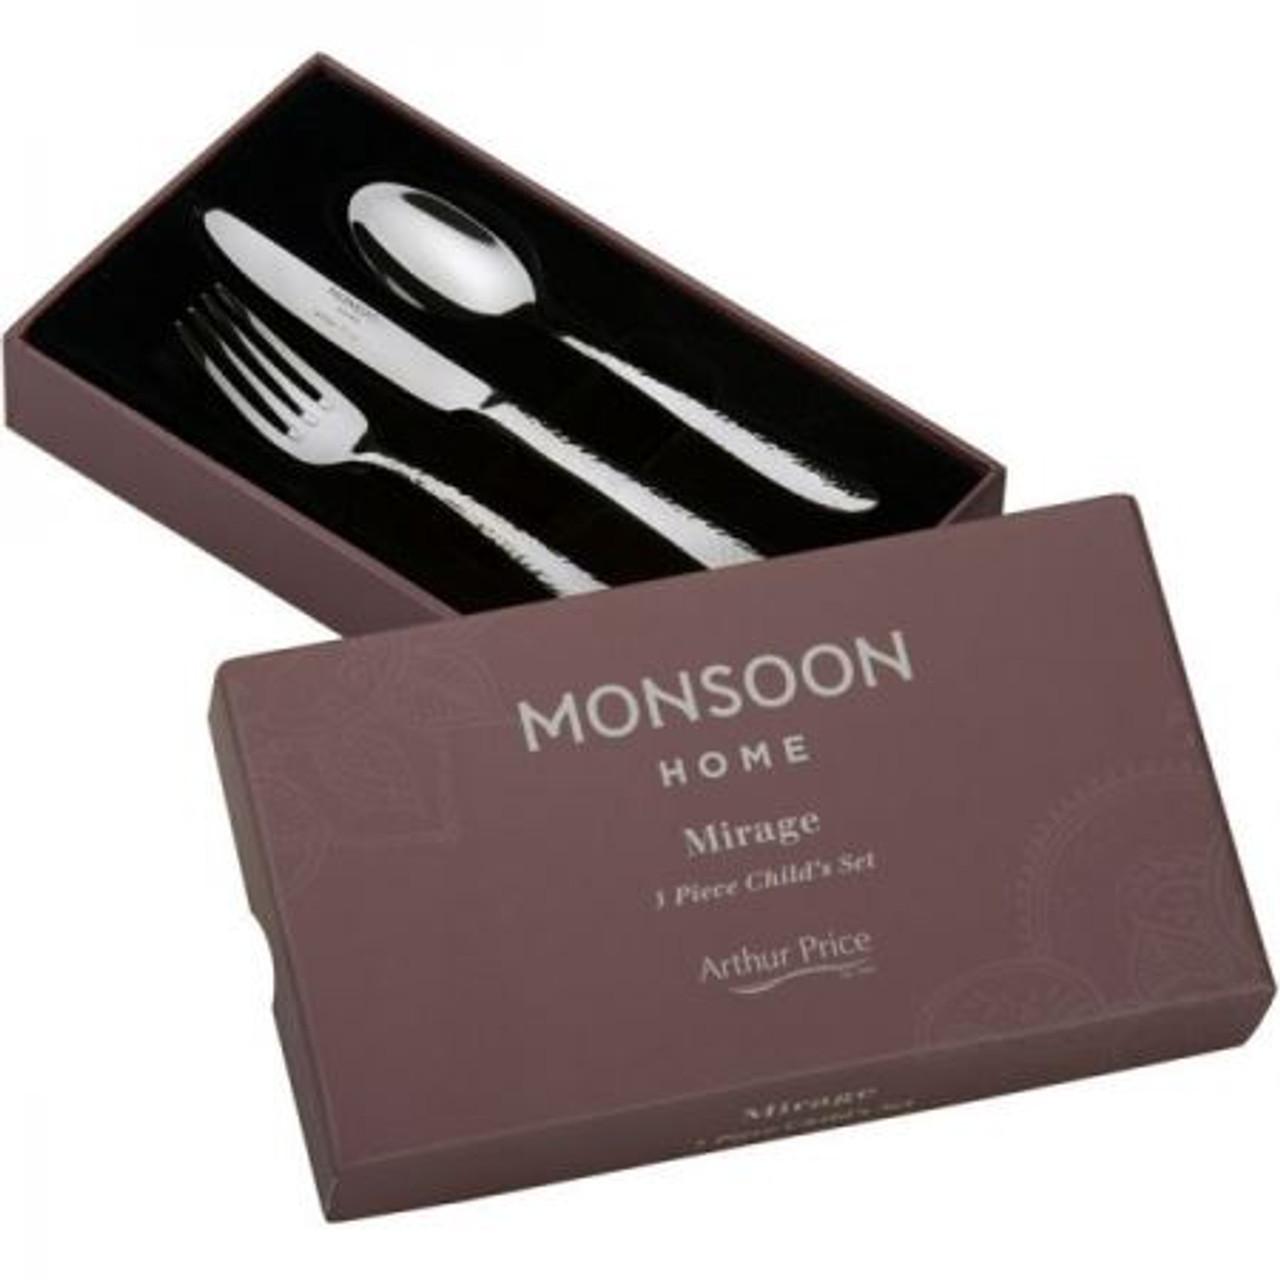 Arthur Price Monsoon Mirage Childs Cutlery Set